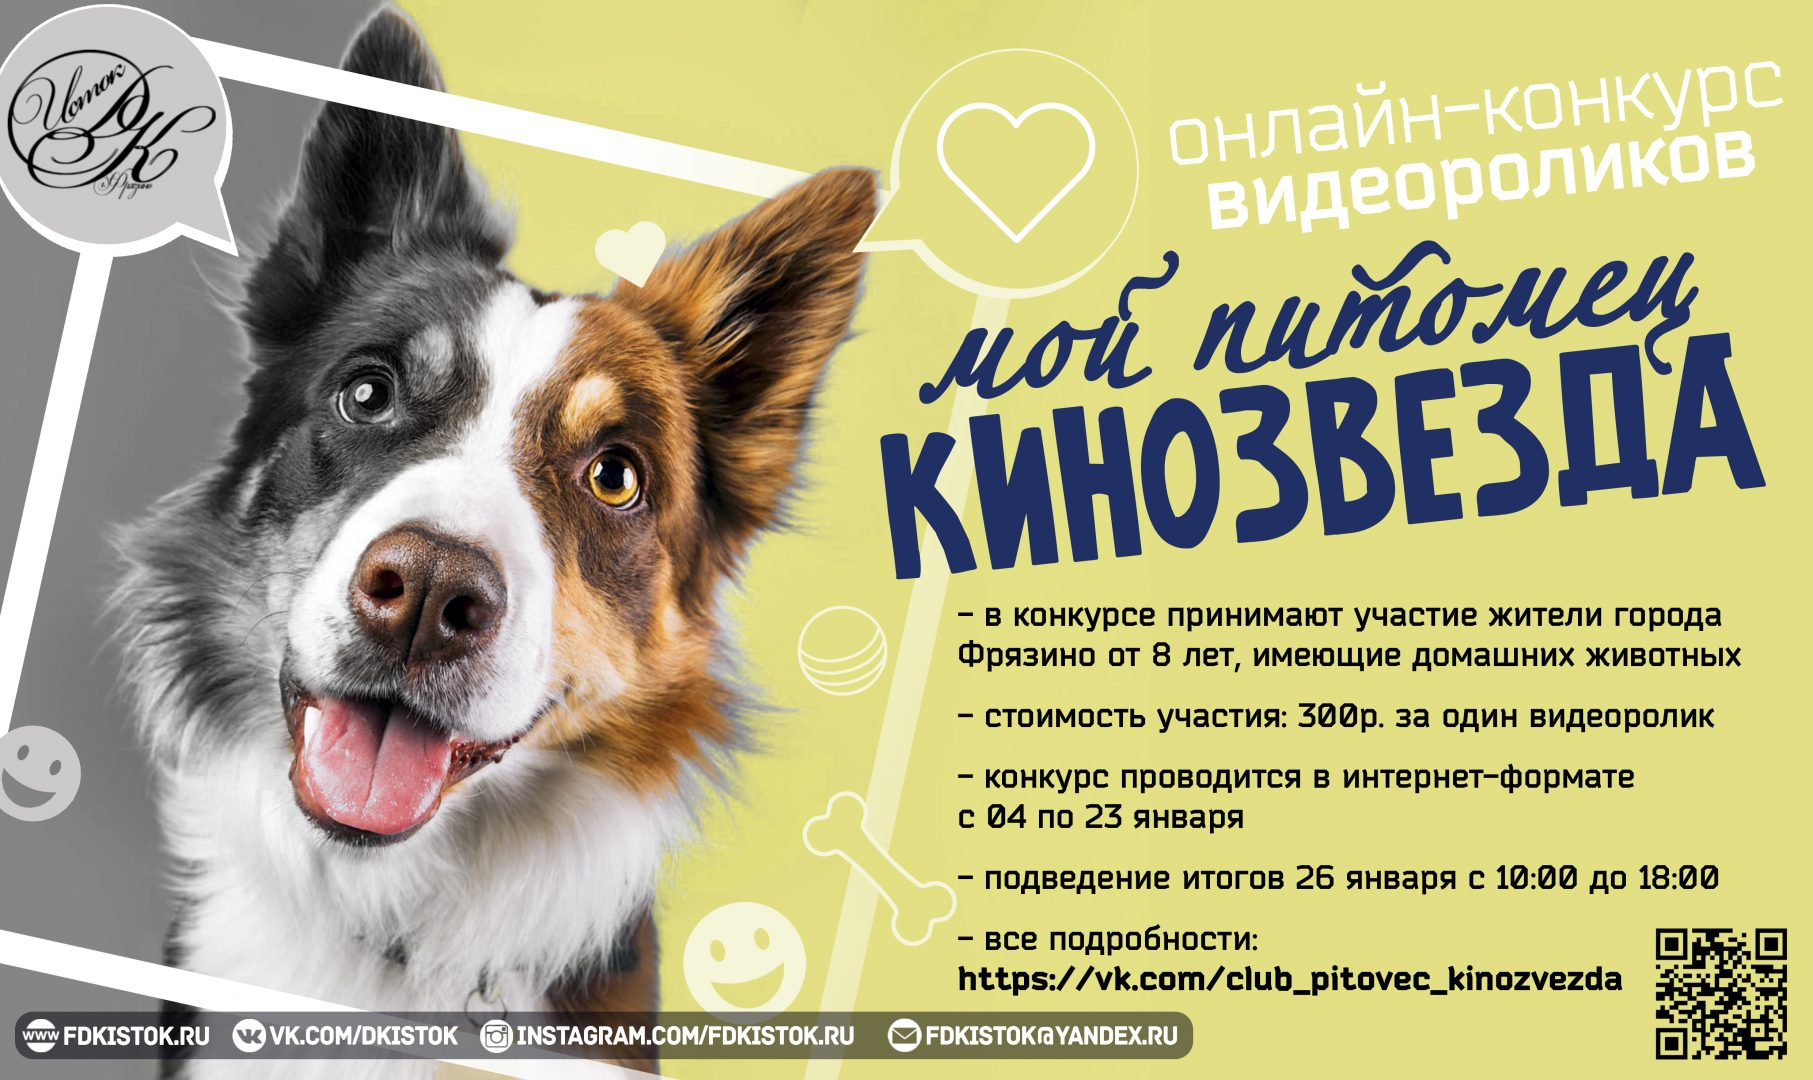 "Афиша онлайн-конкурса ""Мой питомец - кинозвезда"""